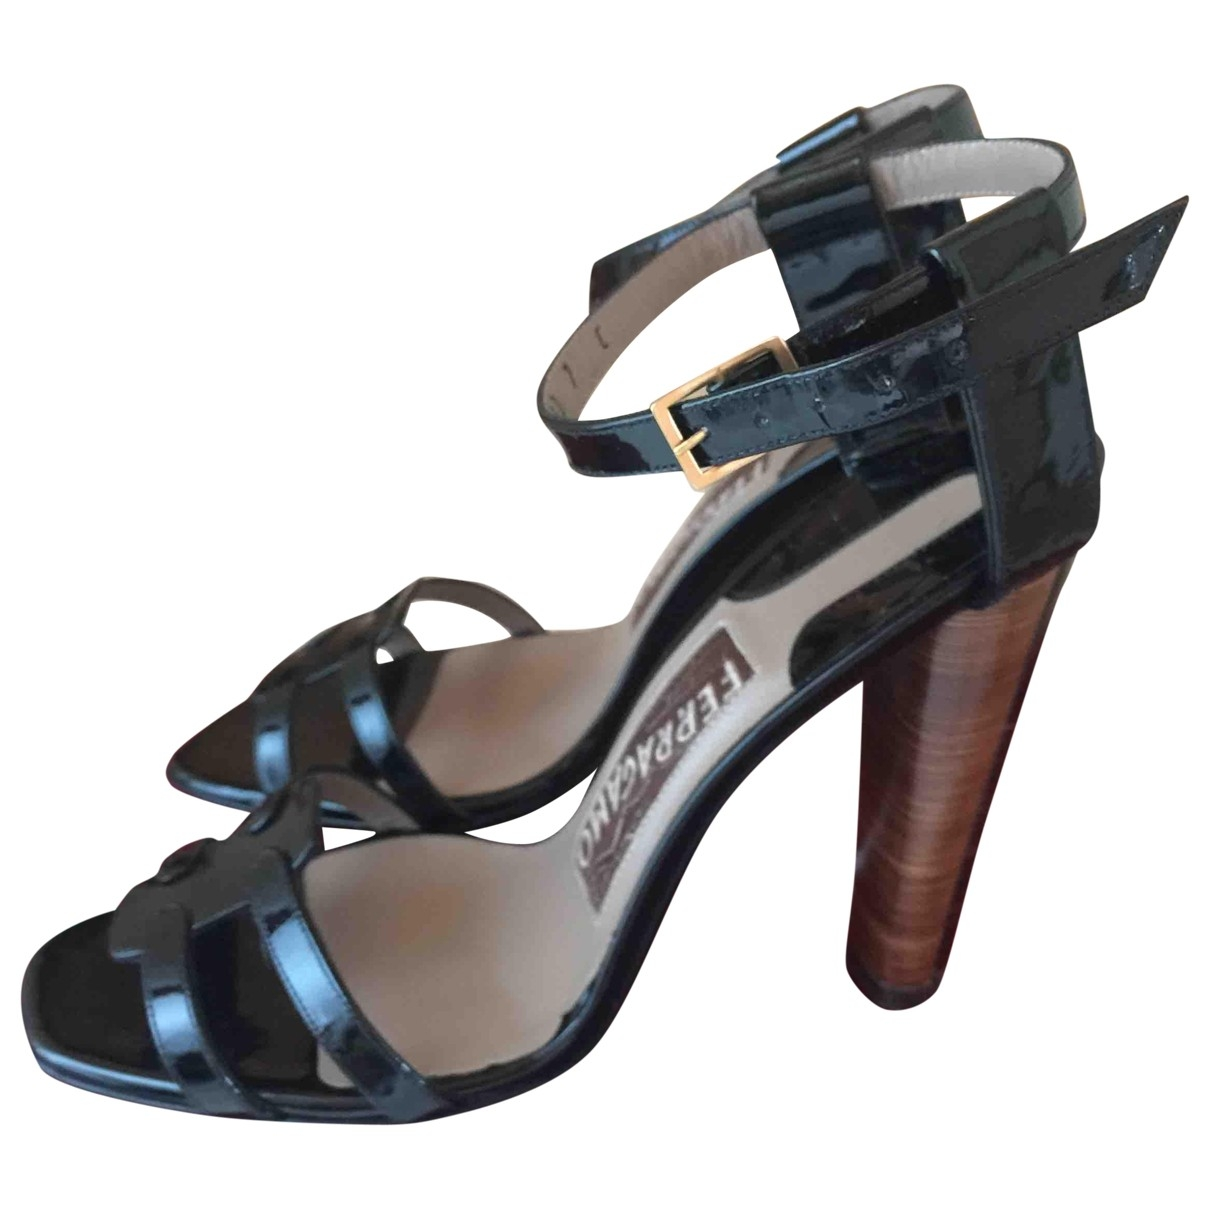 Salvatore Ferragamo \N Black Patent leather Sandals for Women 37.5 EU